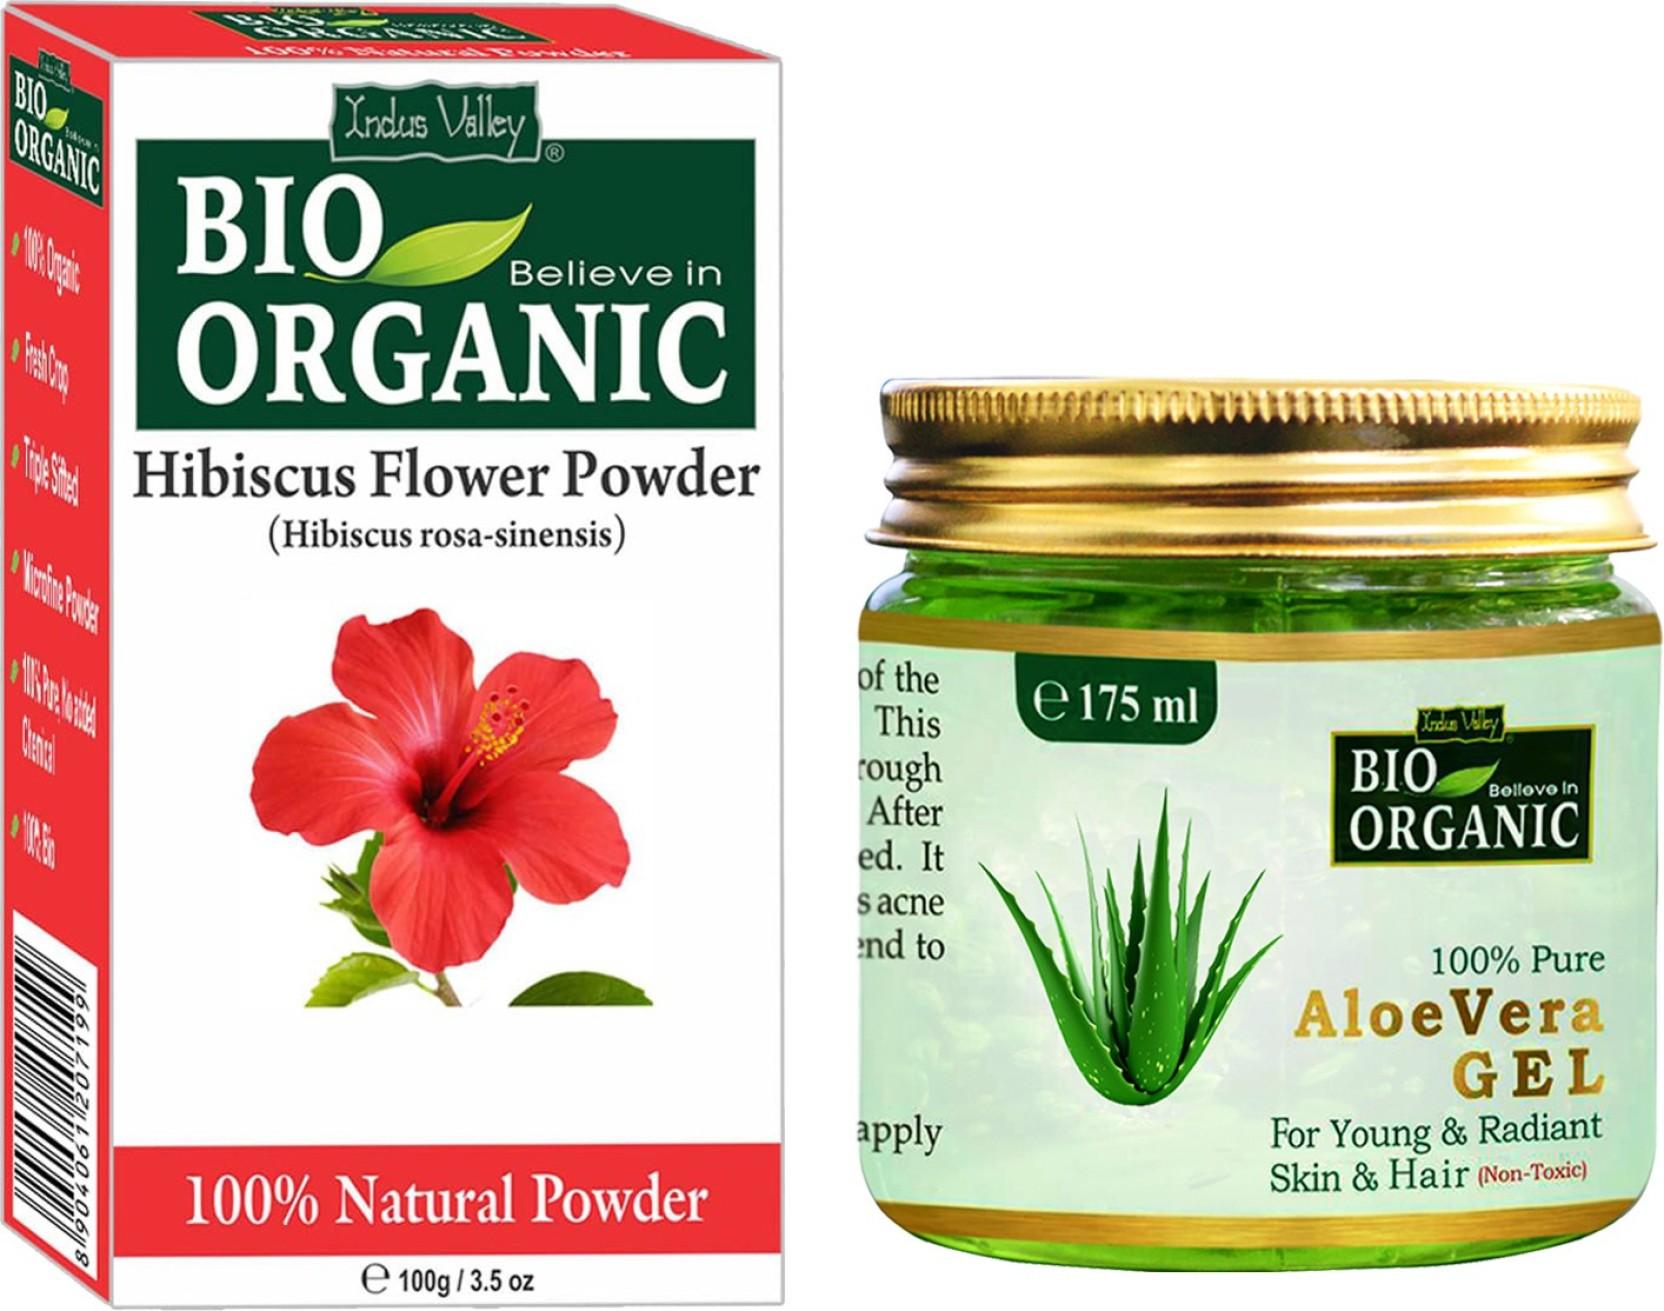 Indus valley bio organic aloe vera gel and hibiscus powder for split on offer izmirmasajfo